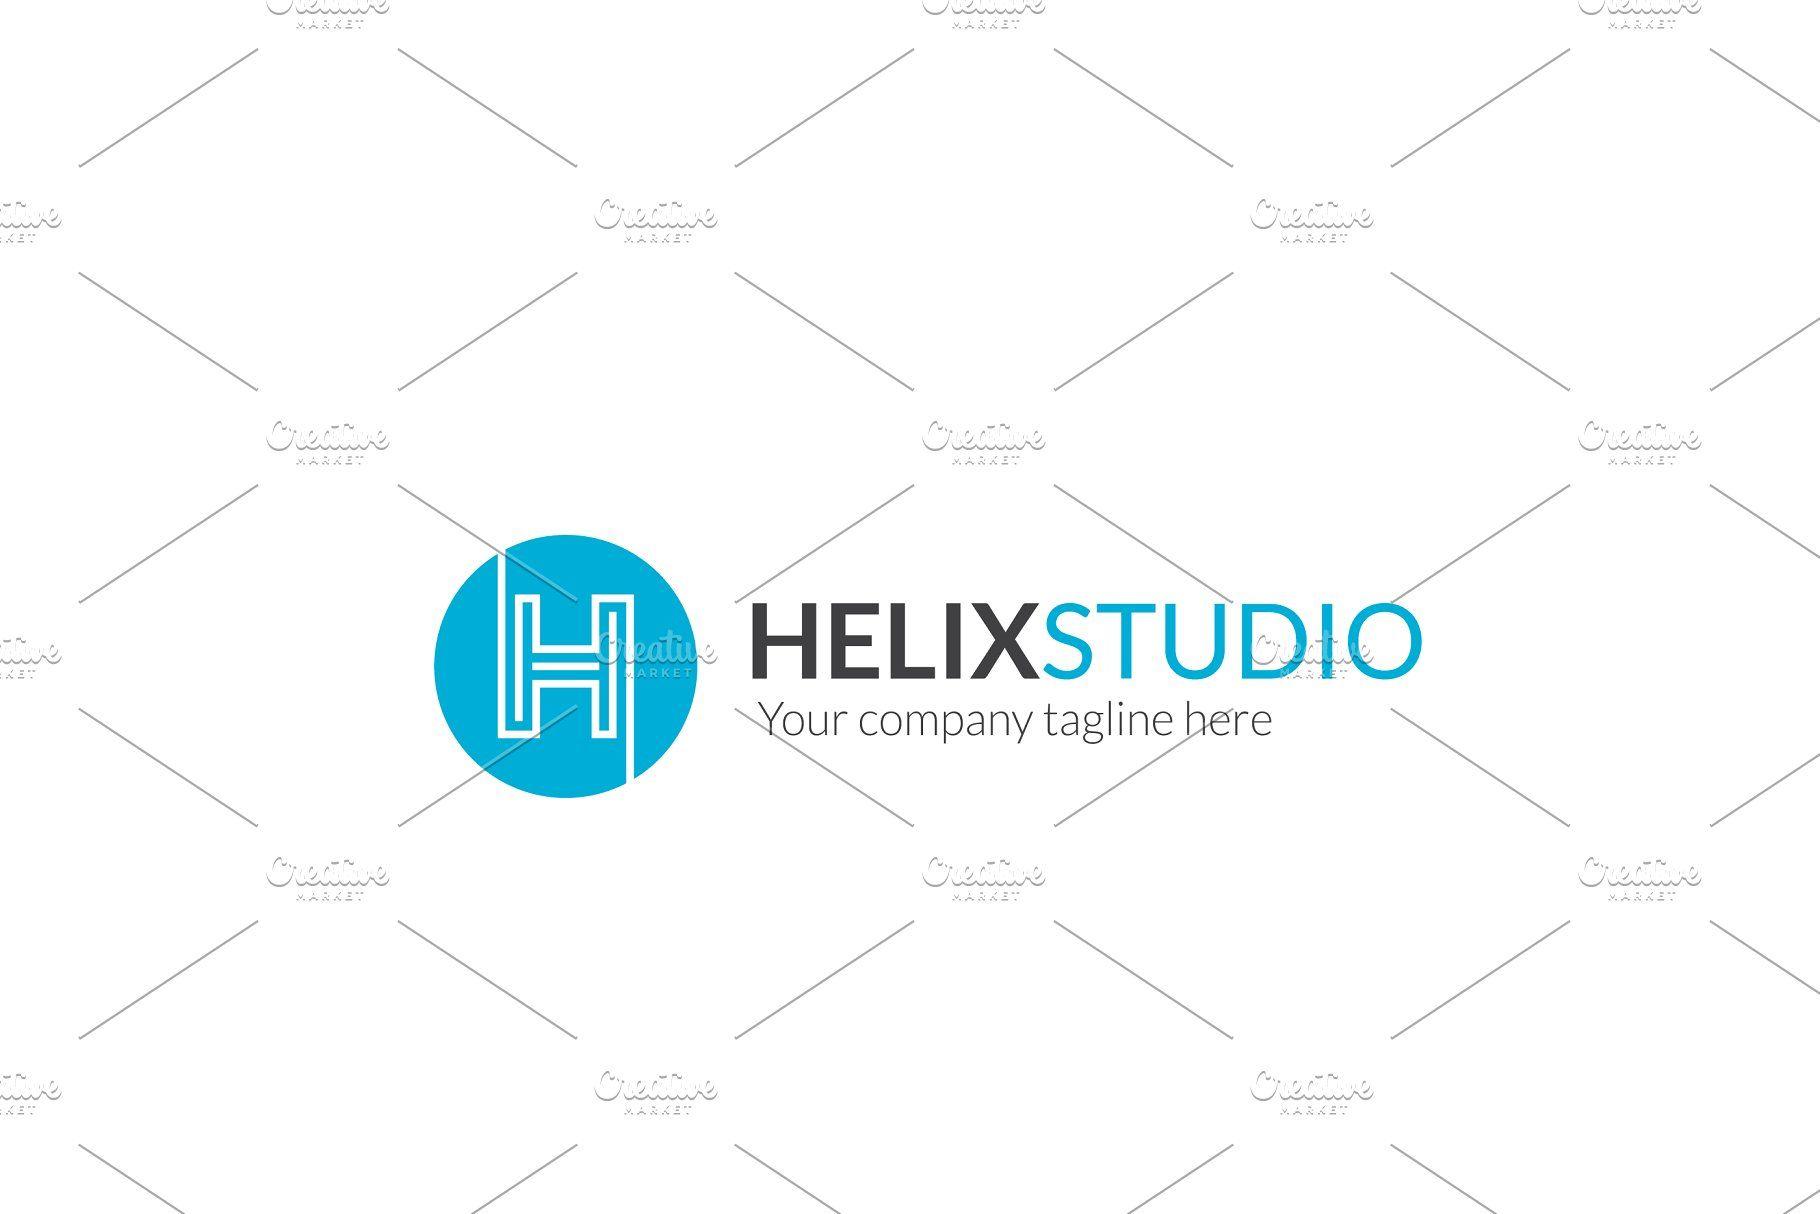 Free helixstudio